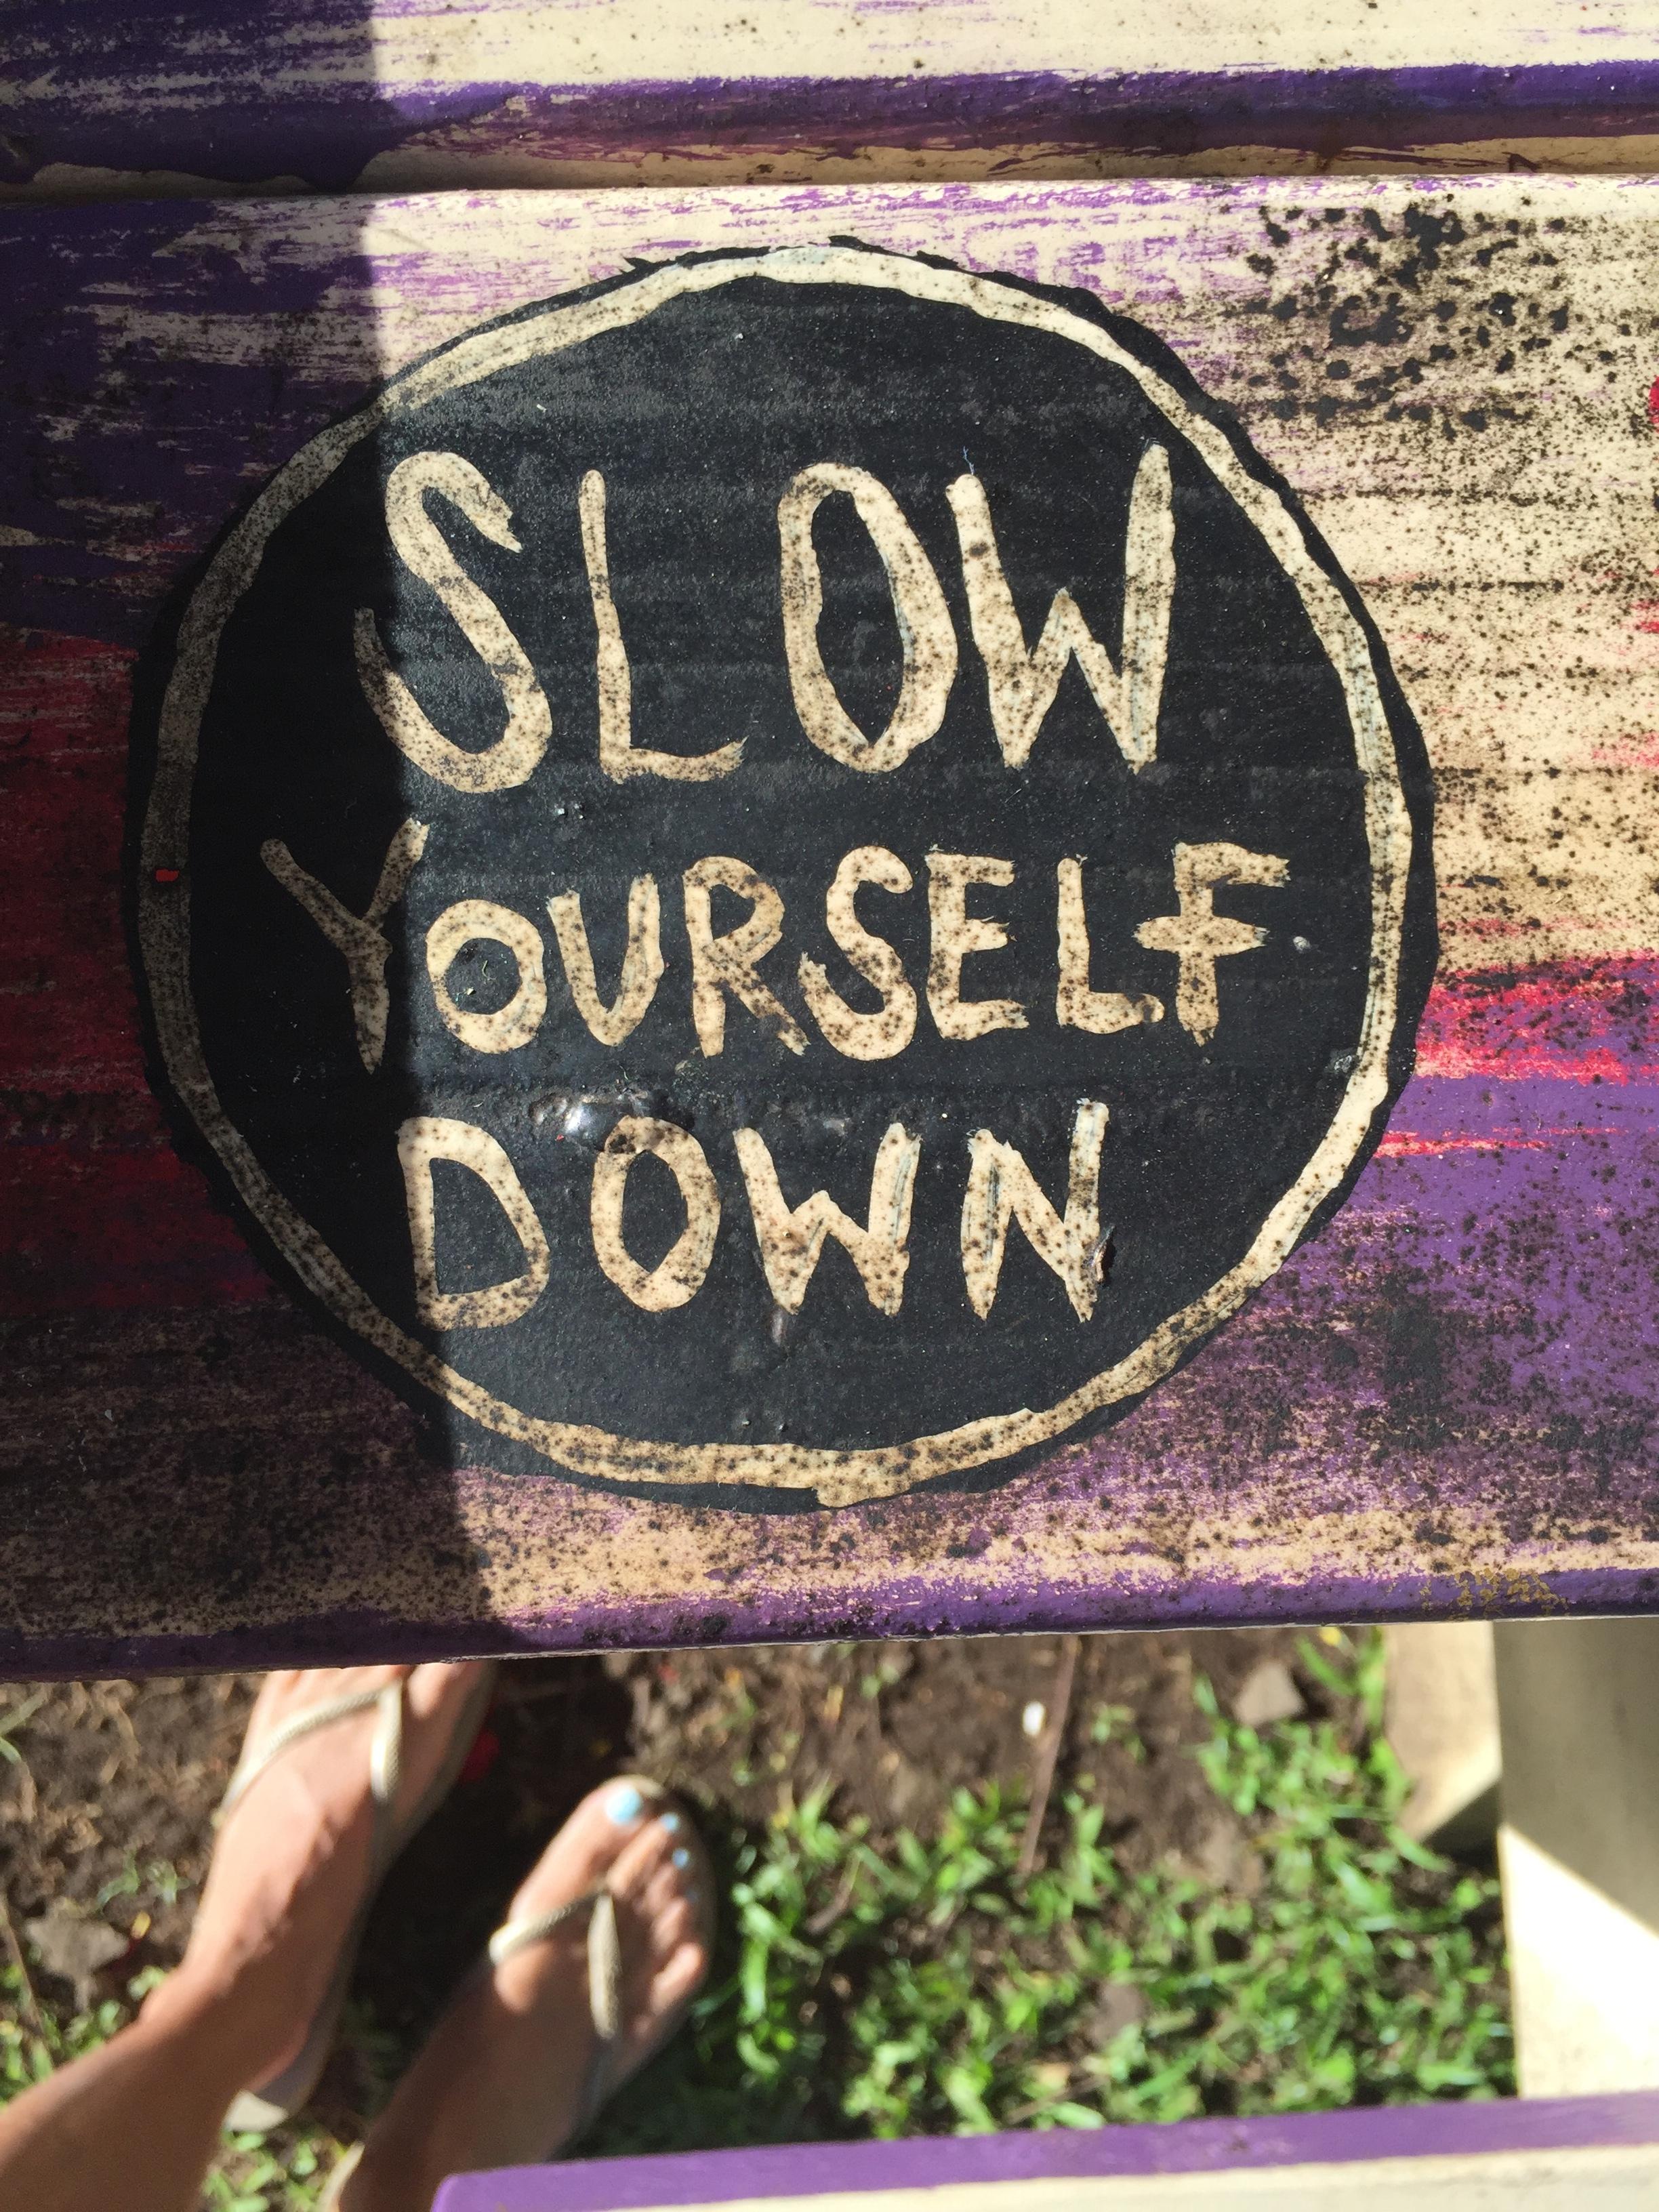 slowyourselfdown